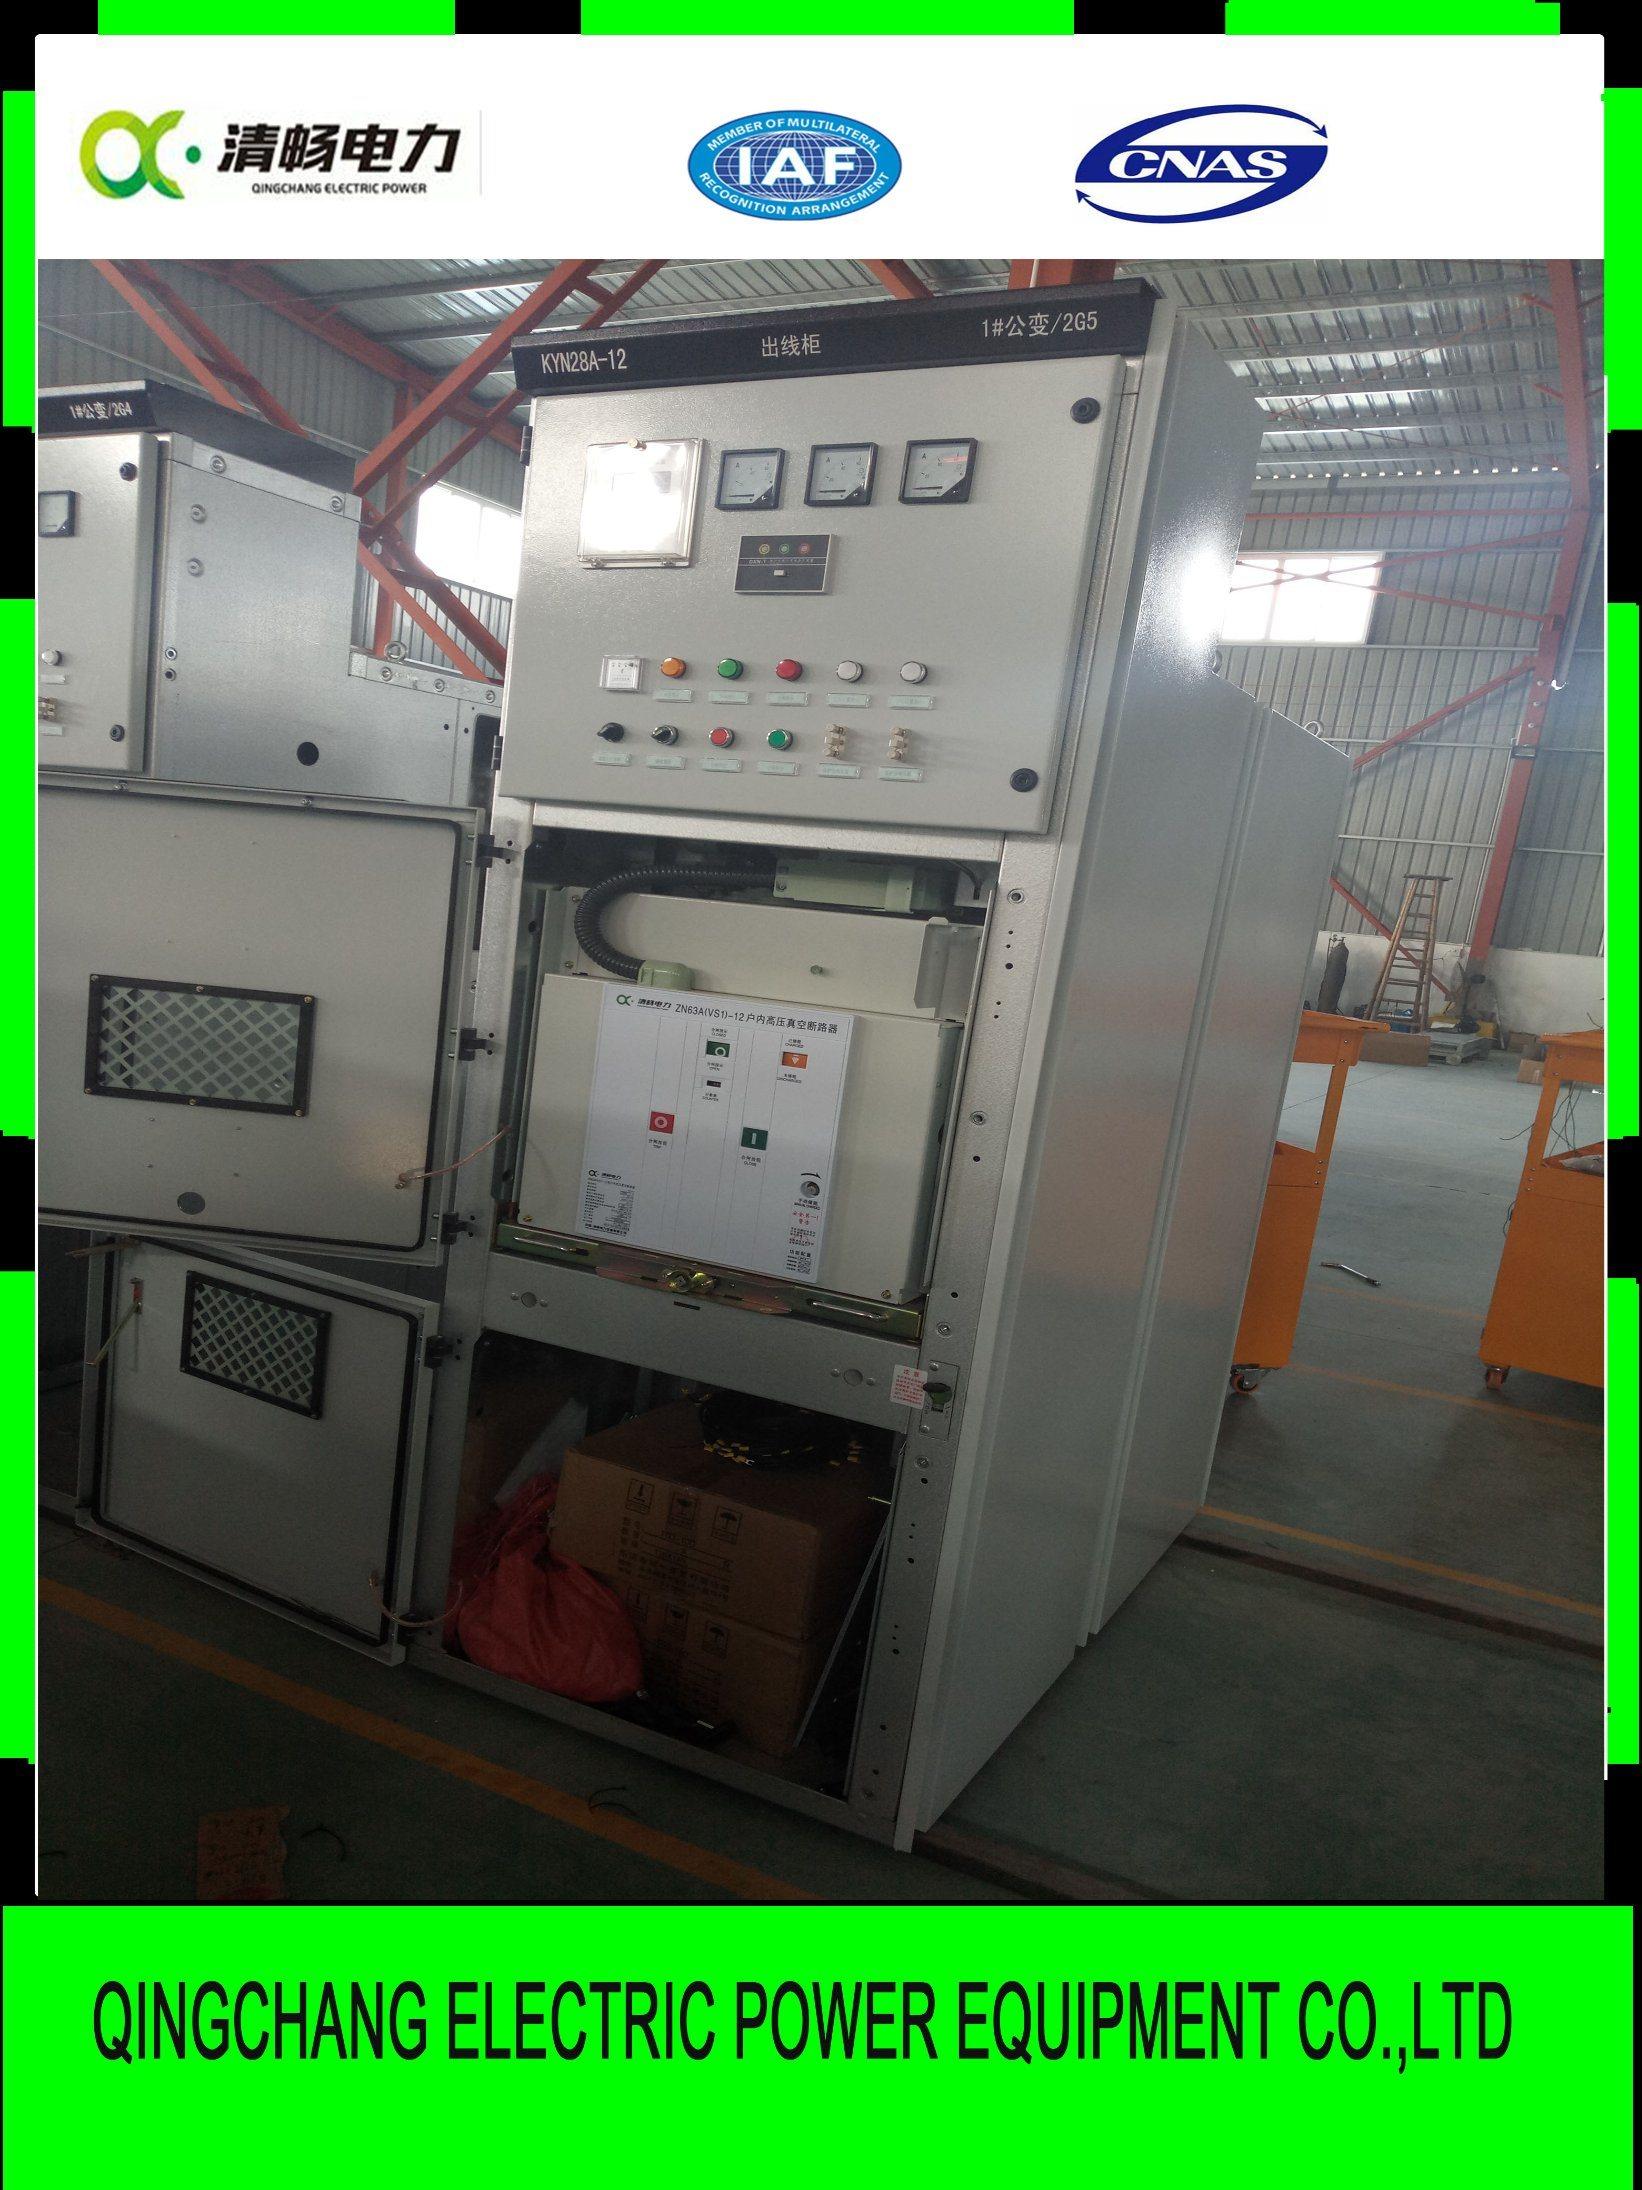 Kyn28A-12 Medium Voltage Switchgear/Cabinet/Panel